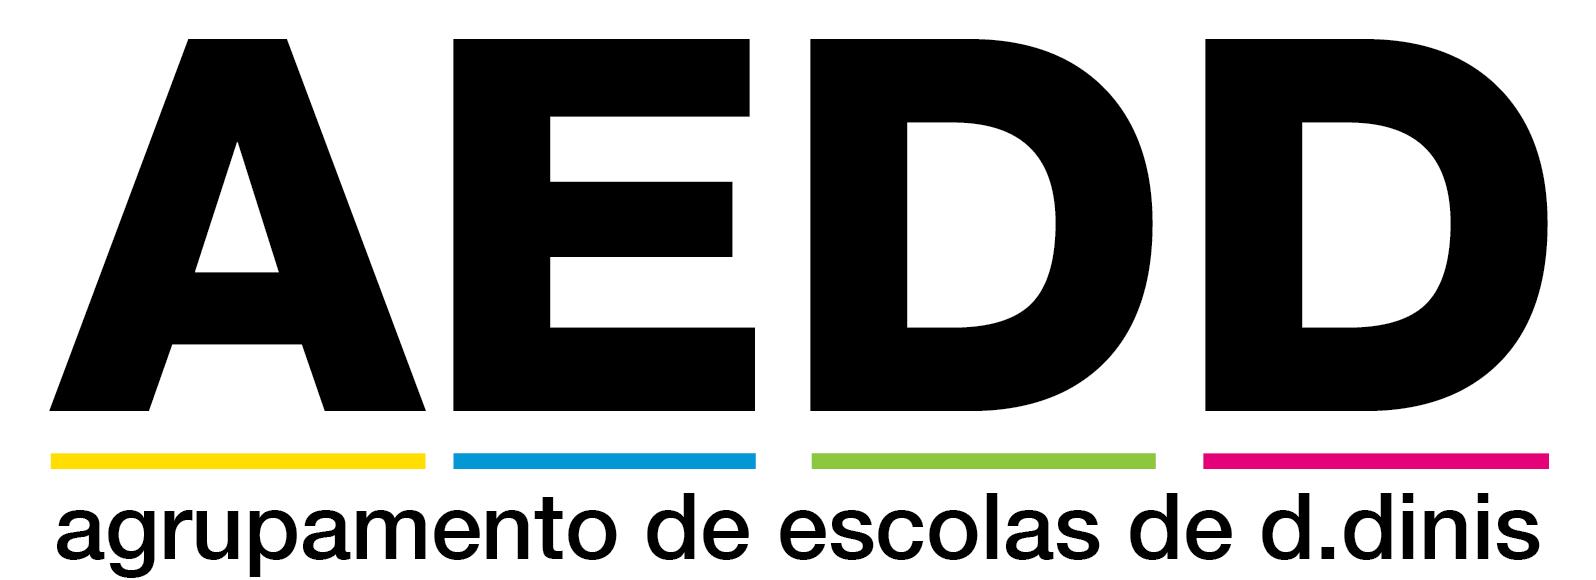 Agrupamento de Escolas de D. Dinis, Marvila, Lisboa